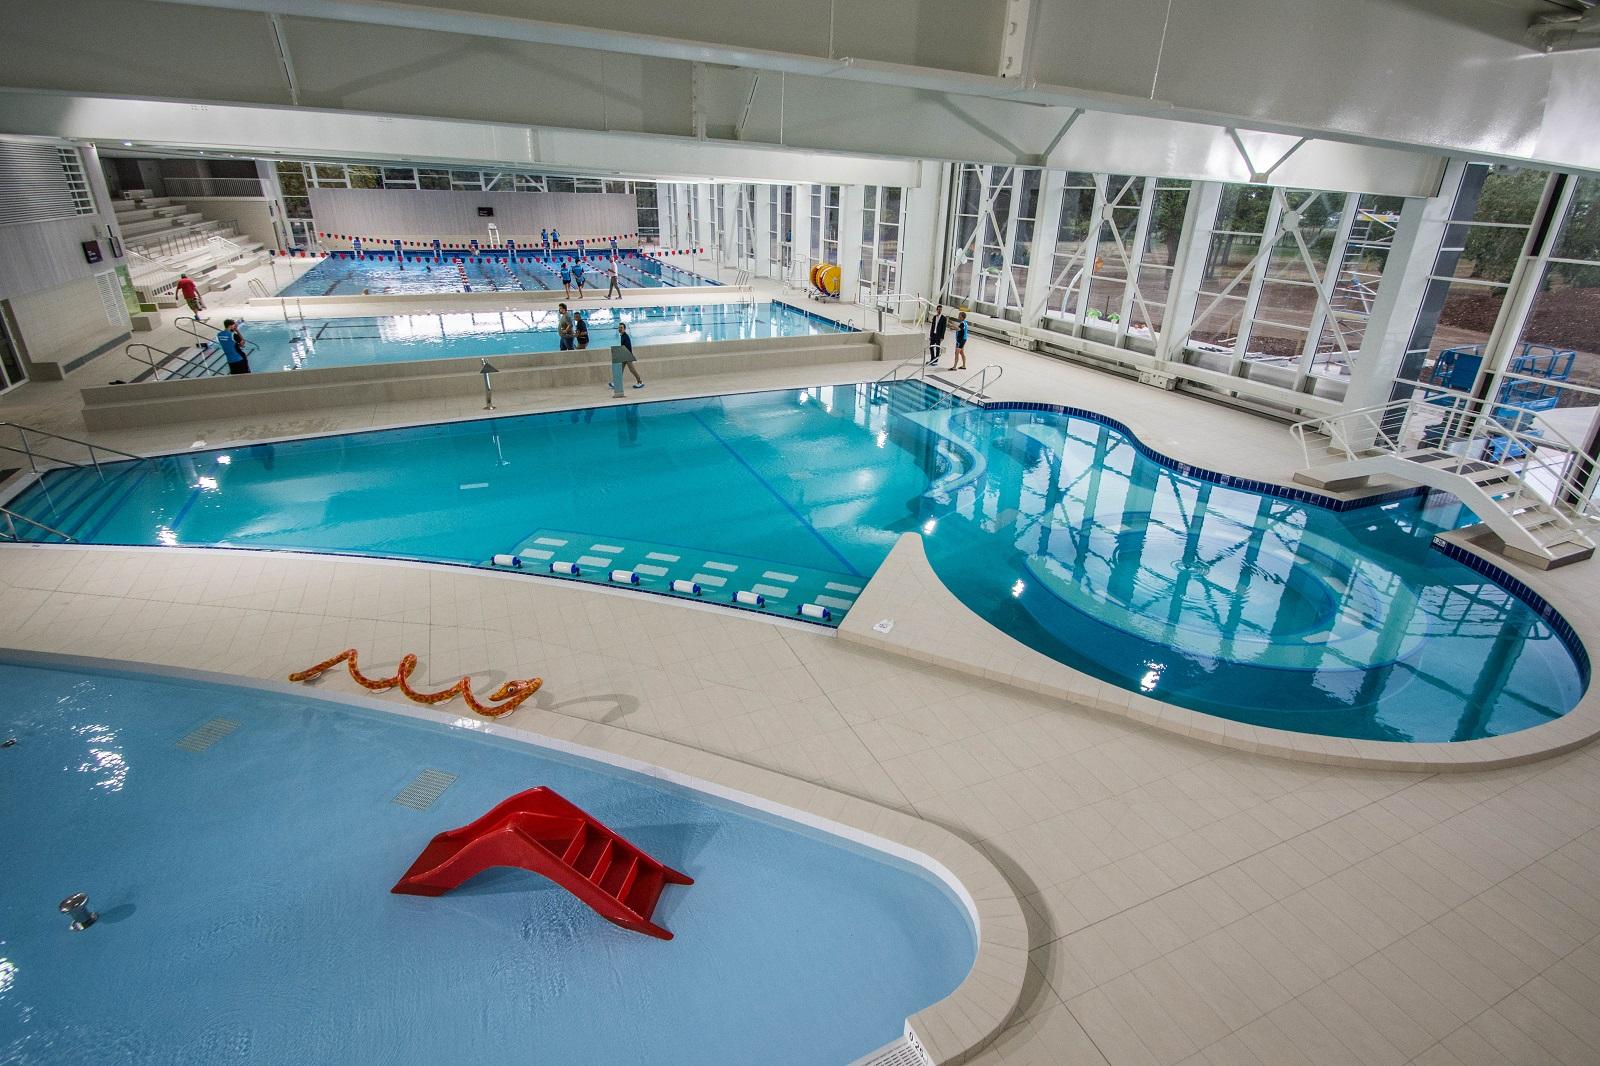 Nautilia - centre aquatique du Florival